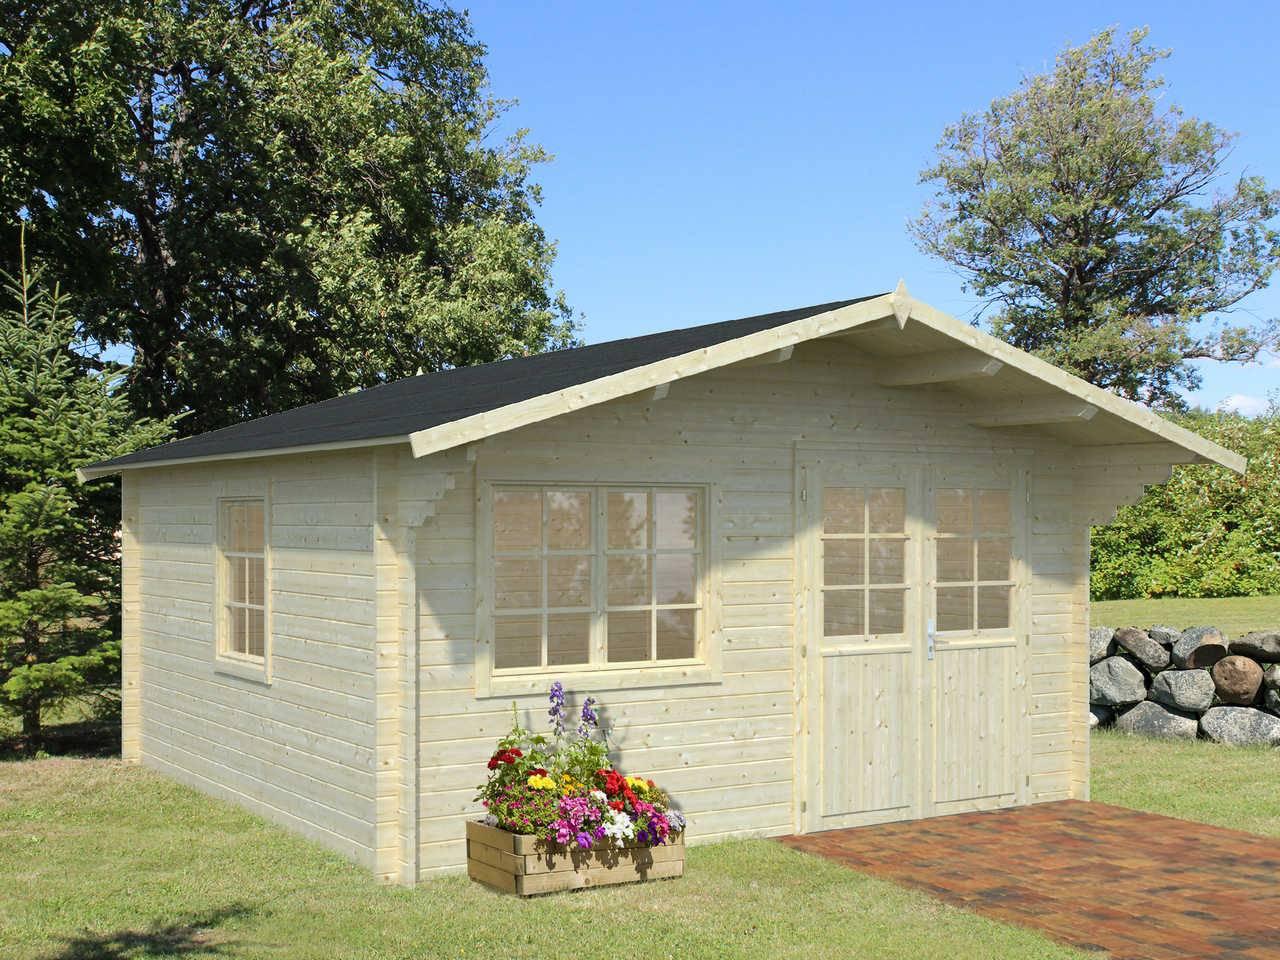 palmako gartenhaus britta 17 5 m gartenhaus. Black Bedroom Furniture Sets. Home Design Ideas